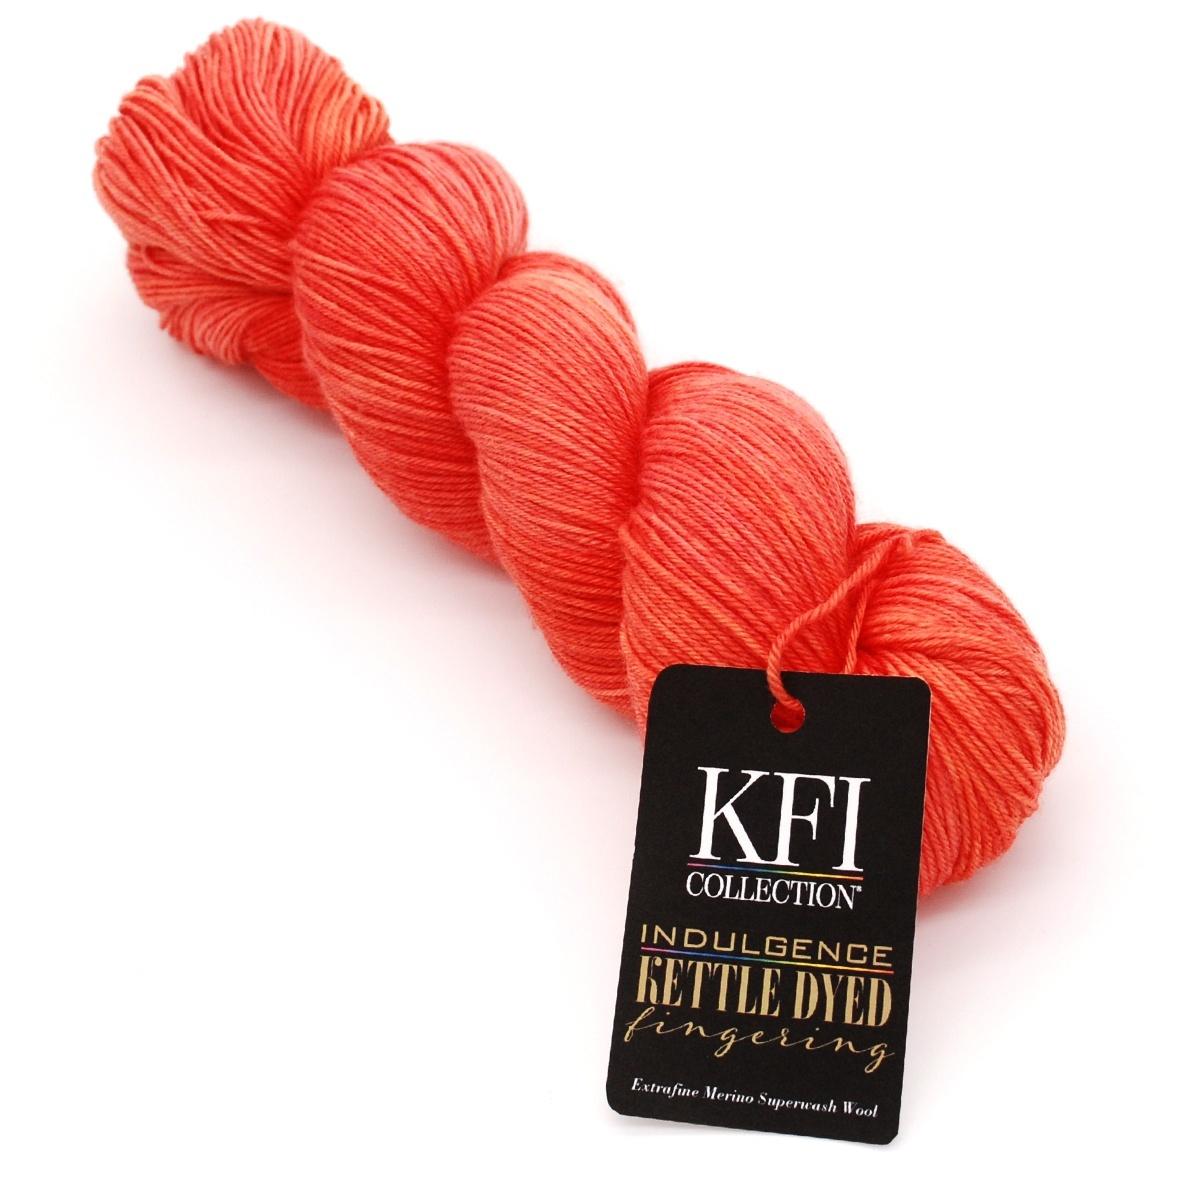 KFI Collection Indulgence Kettle Dyed